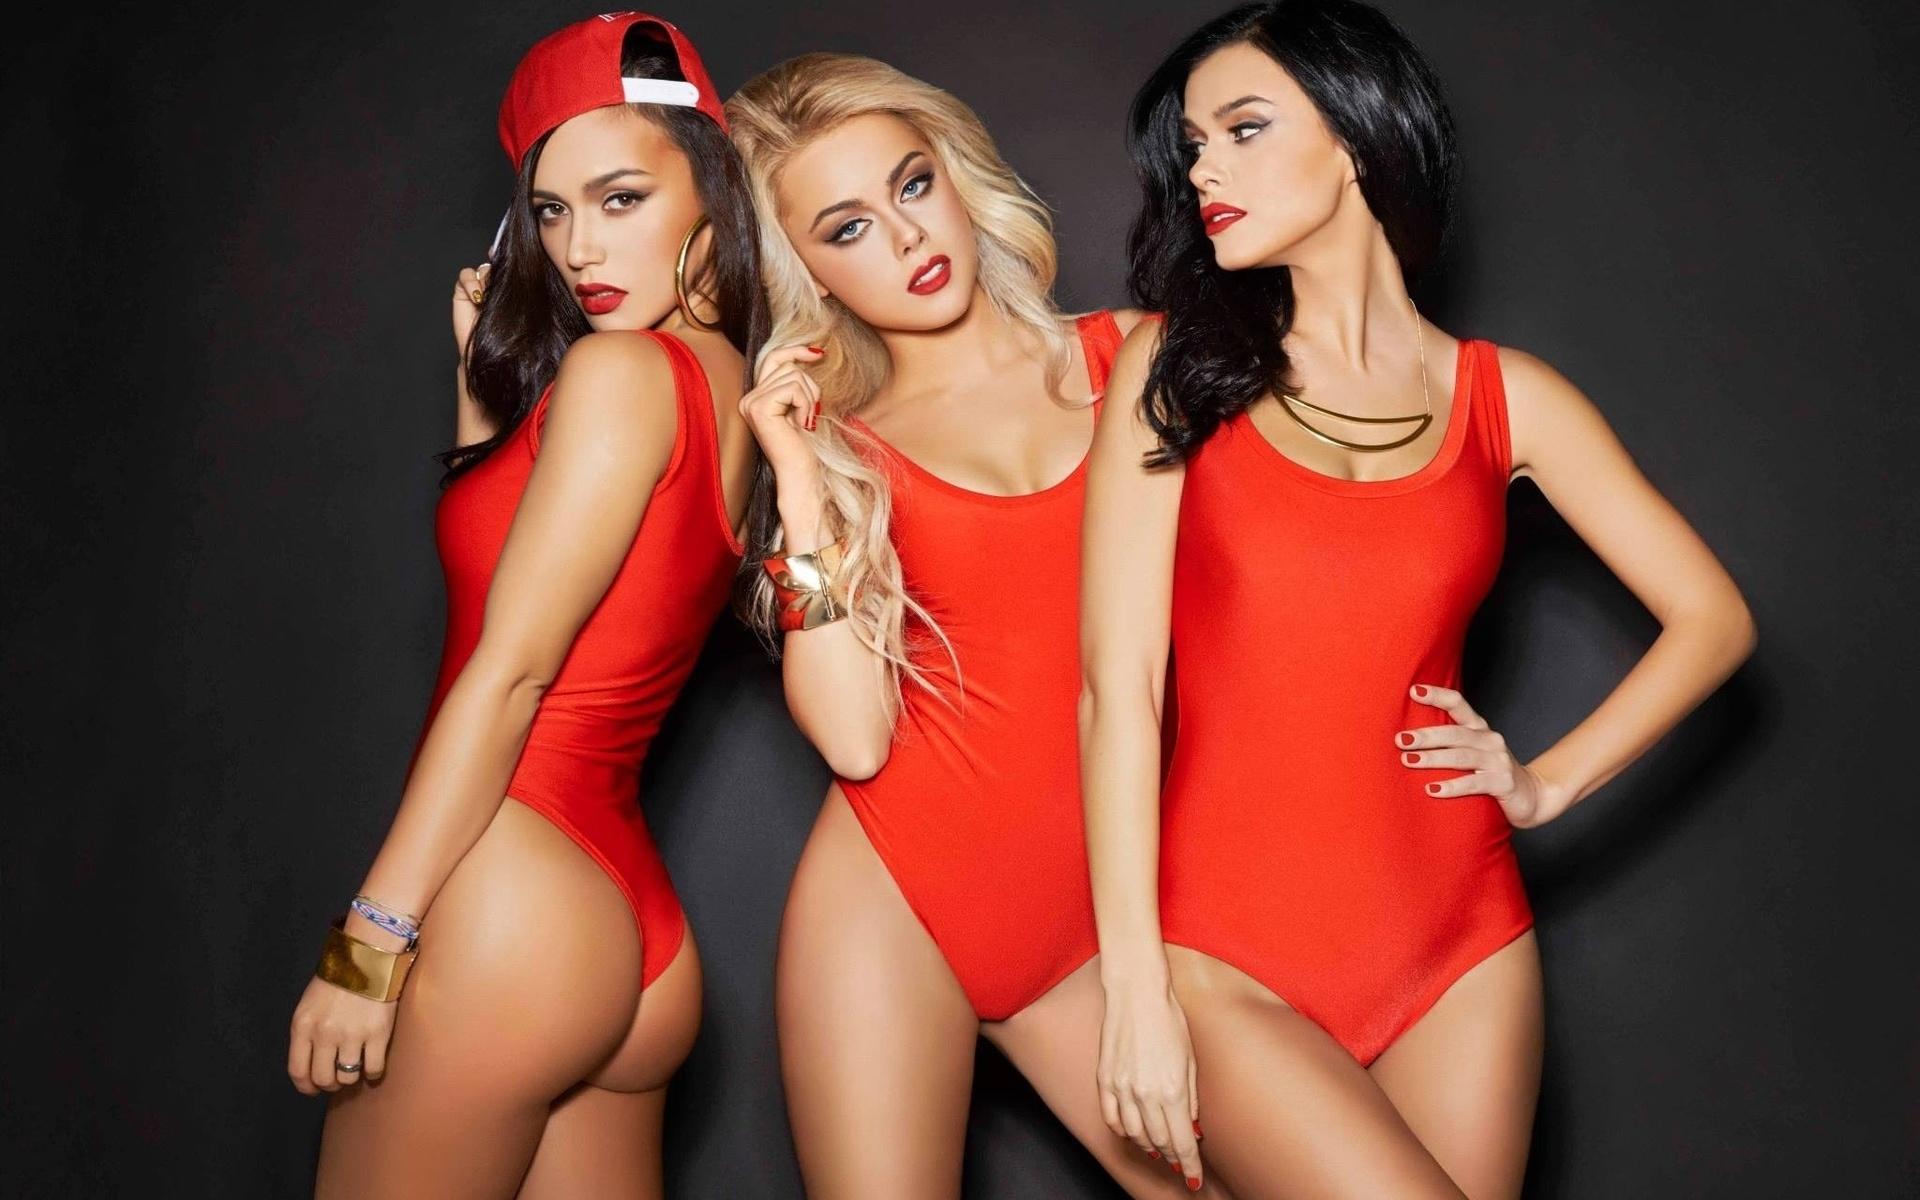 s-sexy-female-music-group-m-girls-chenille-zip